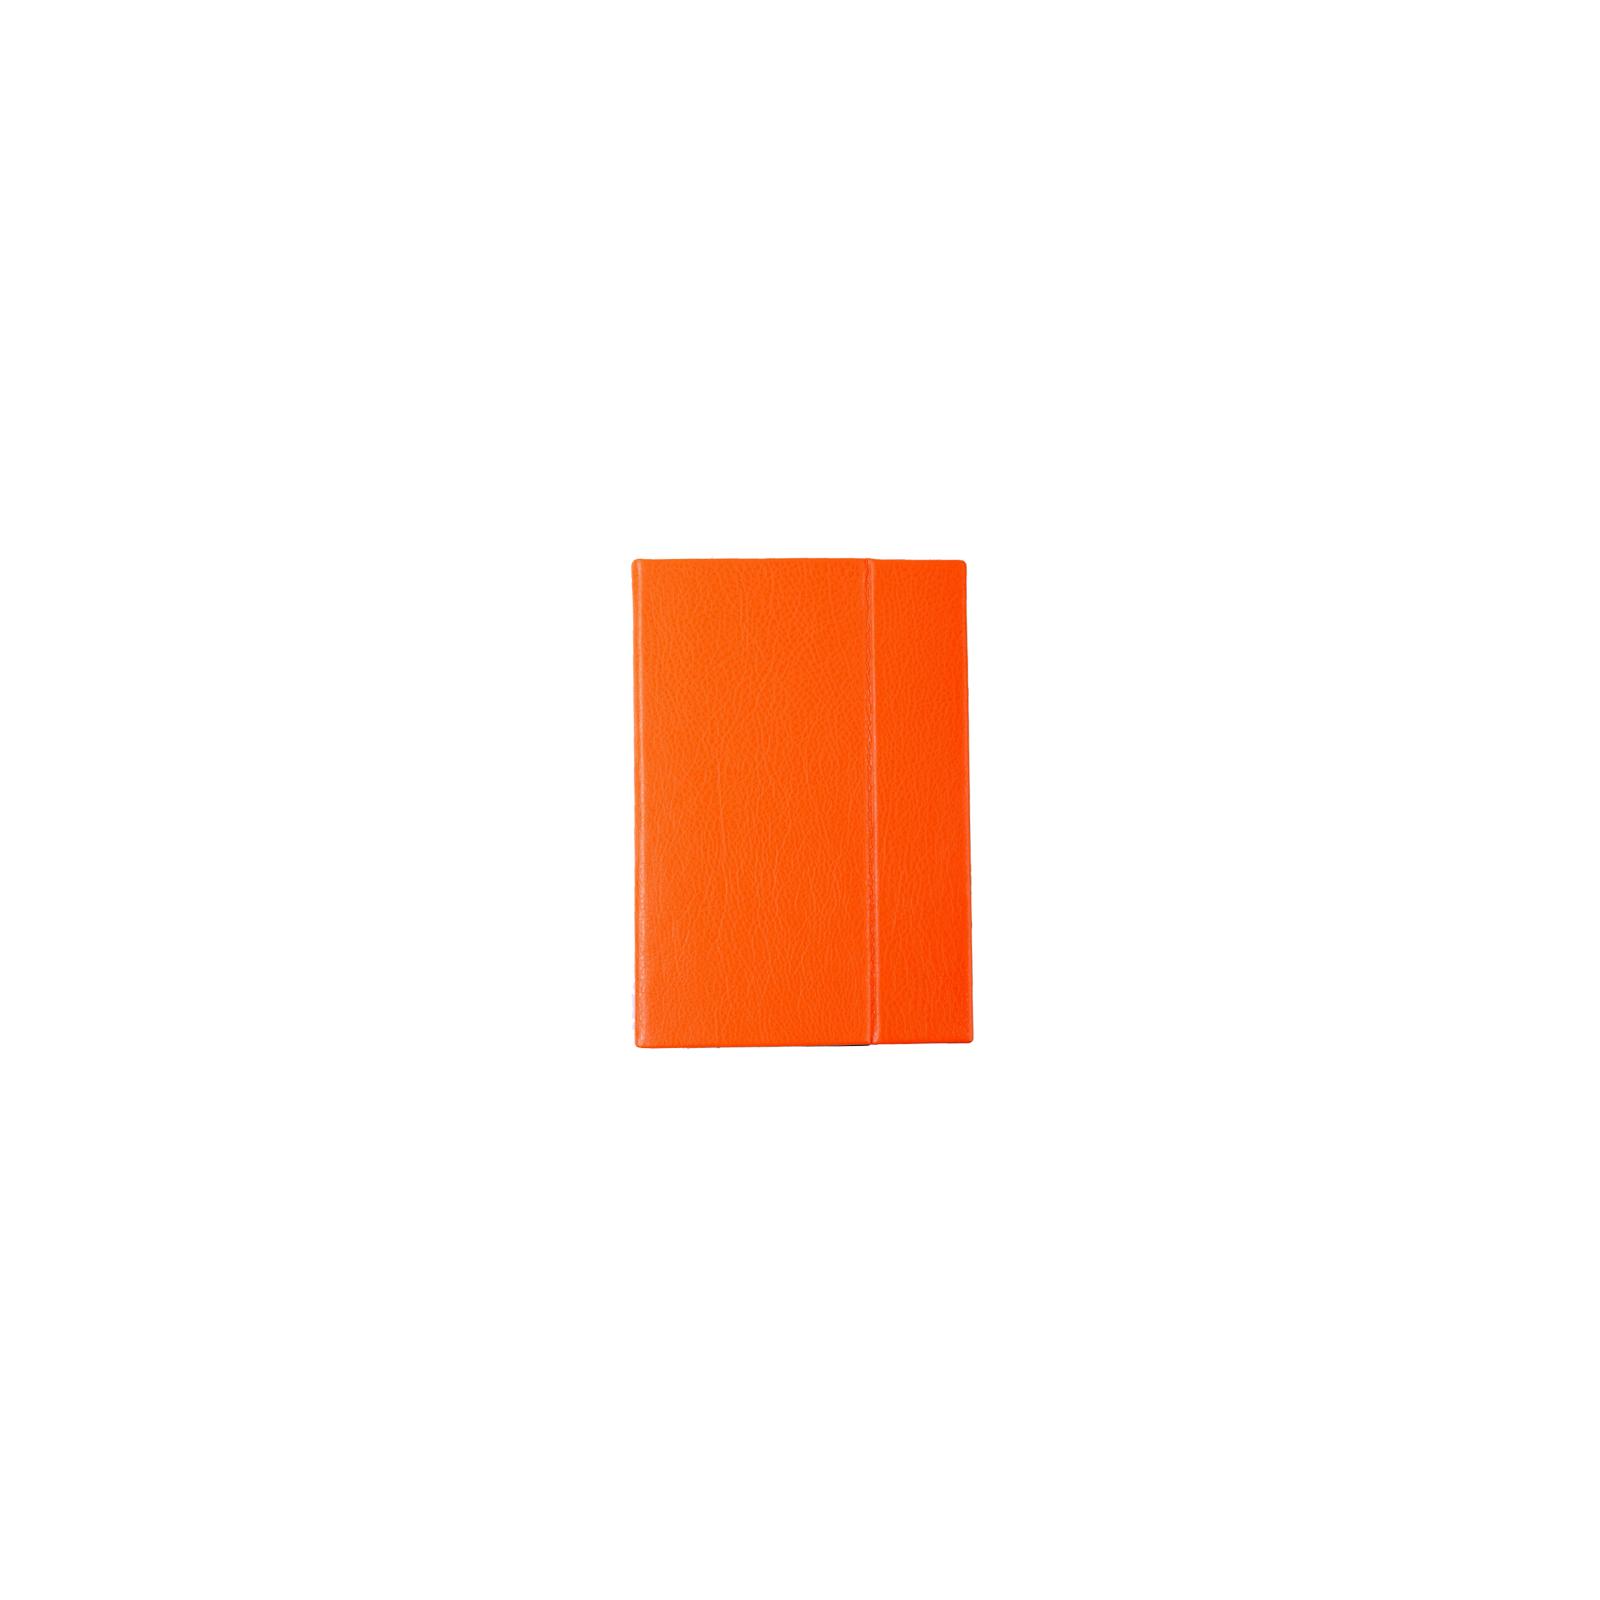 Чехол для планшета Vento 8 Desire Bright - orange изображение 2